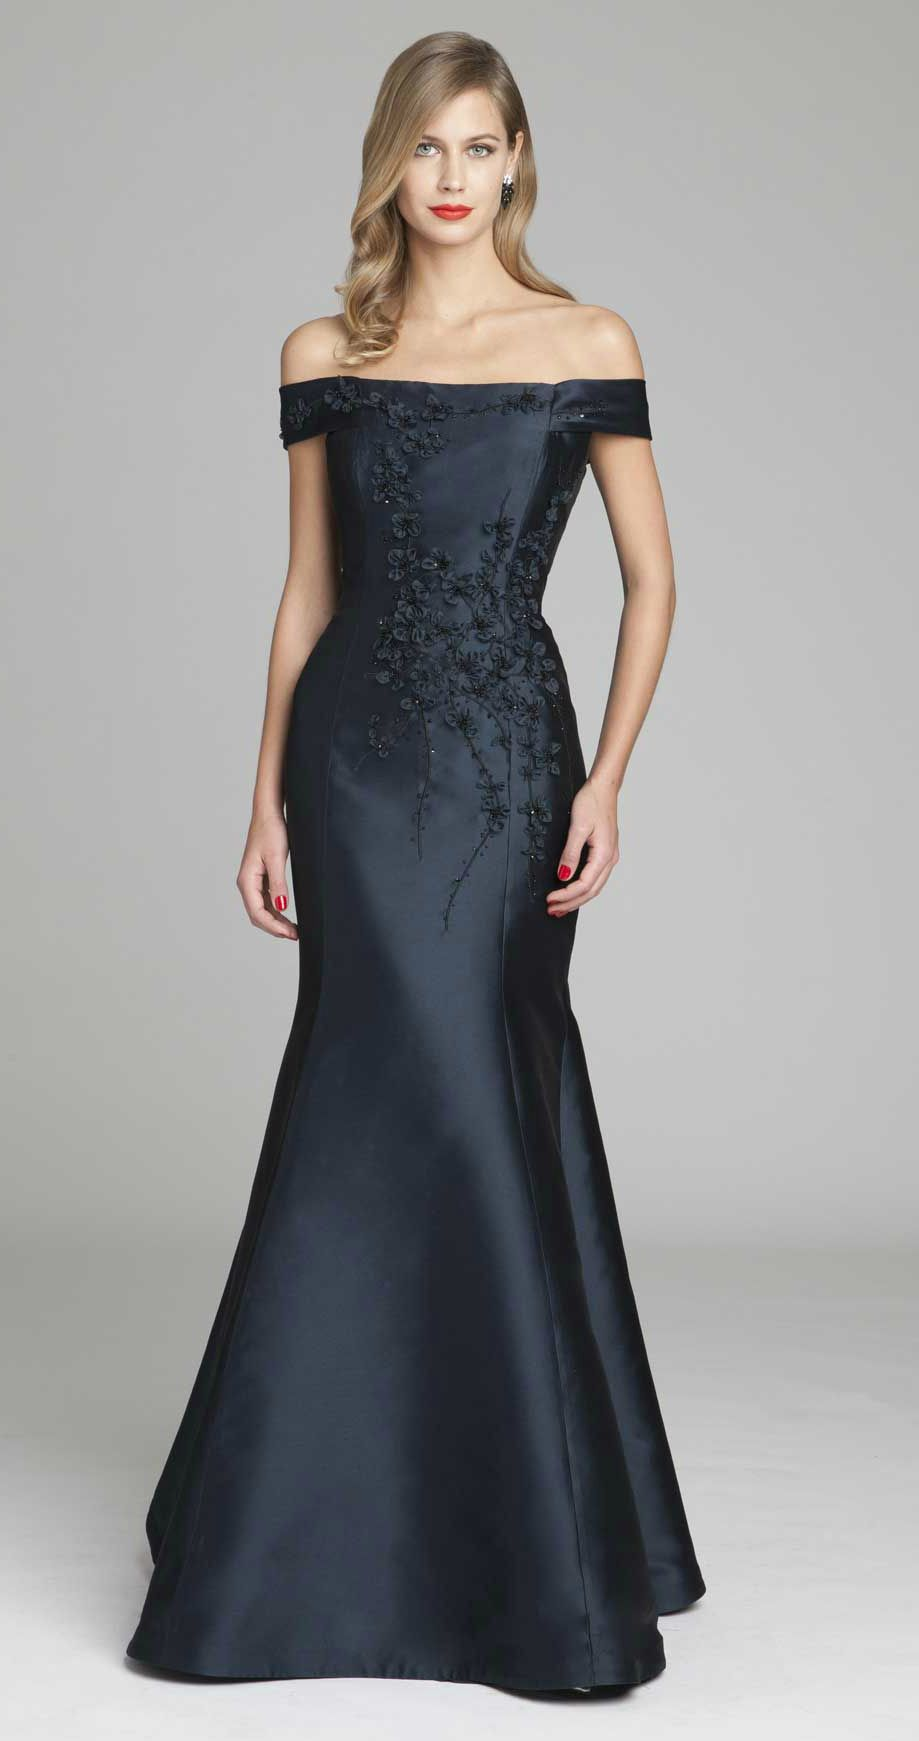 Dark blue mother of the bride dresses mother of groom